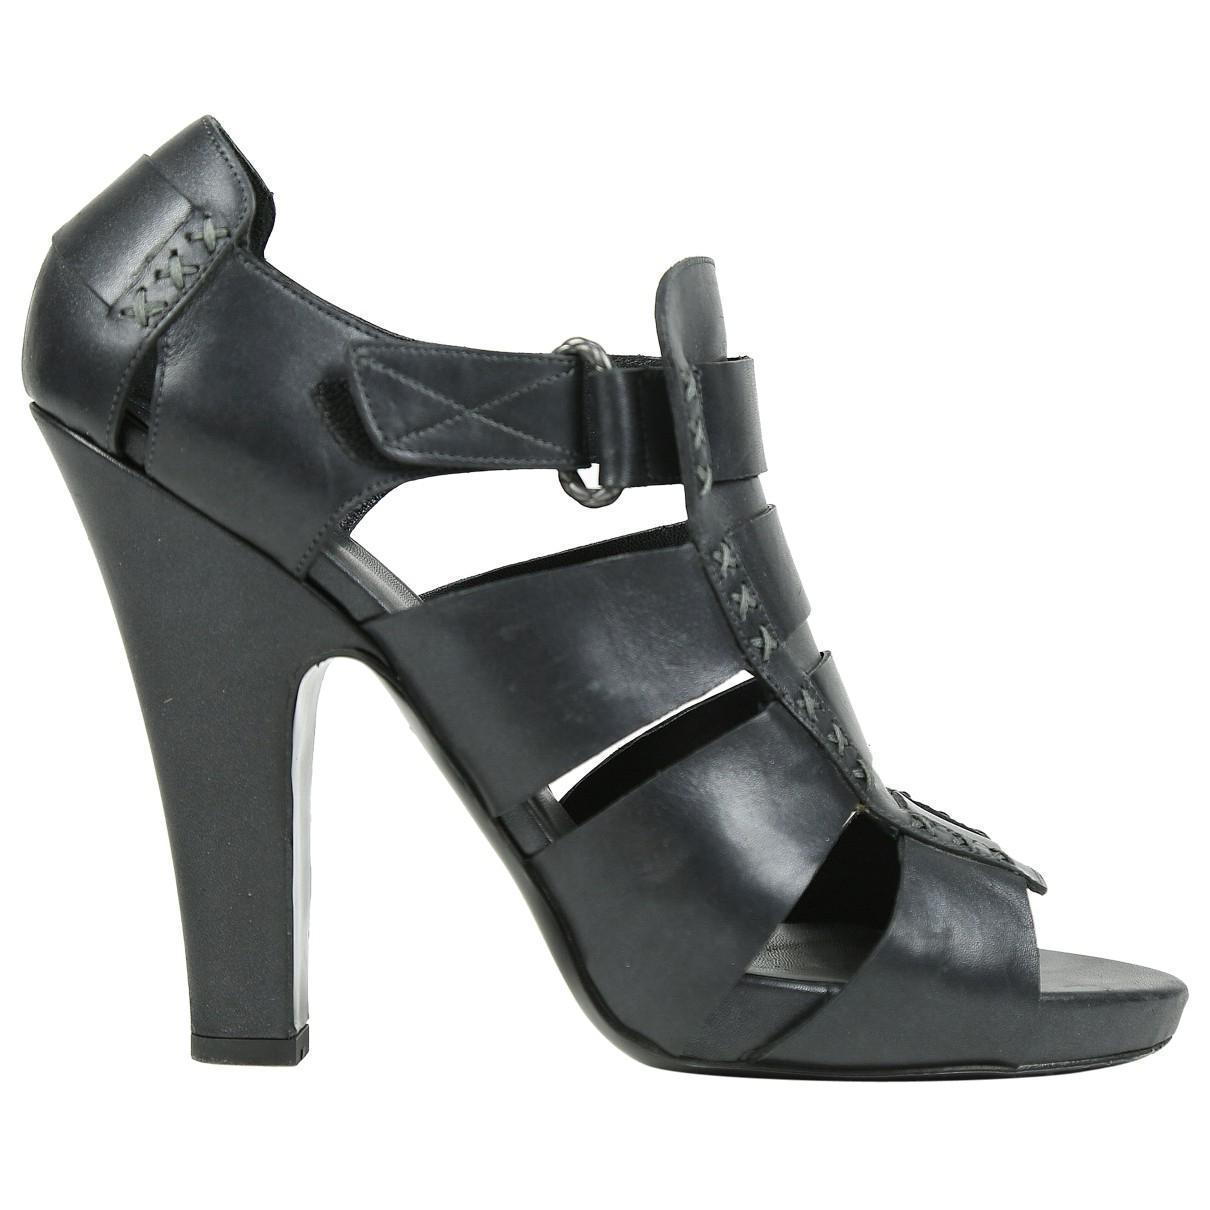 Pre-owned - Patent leather sandals Bottega Veneta iApTS8